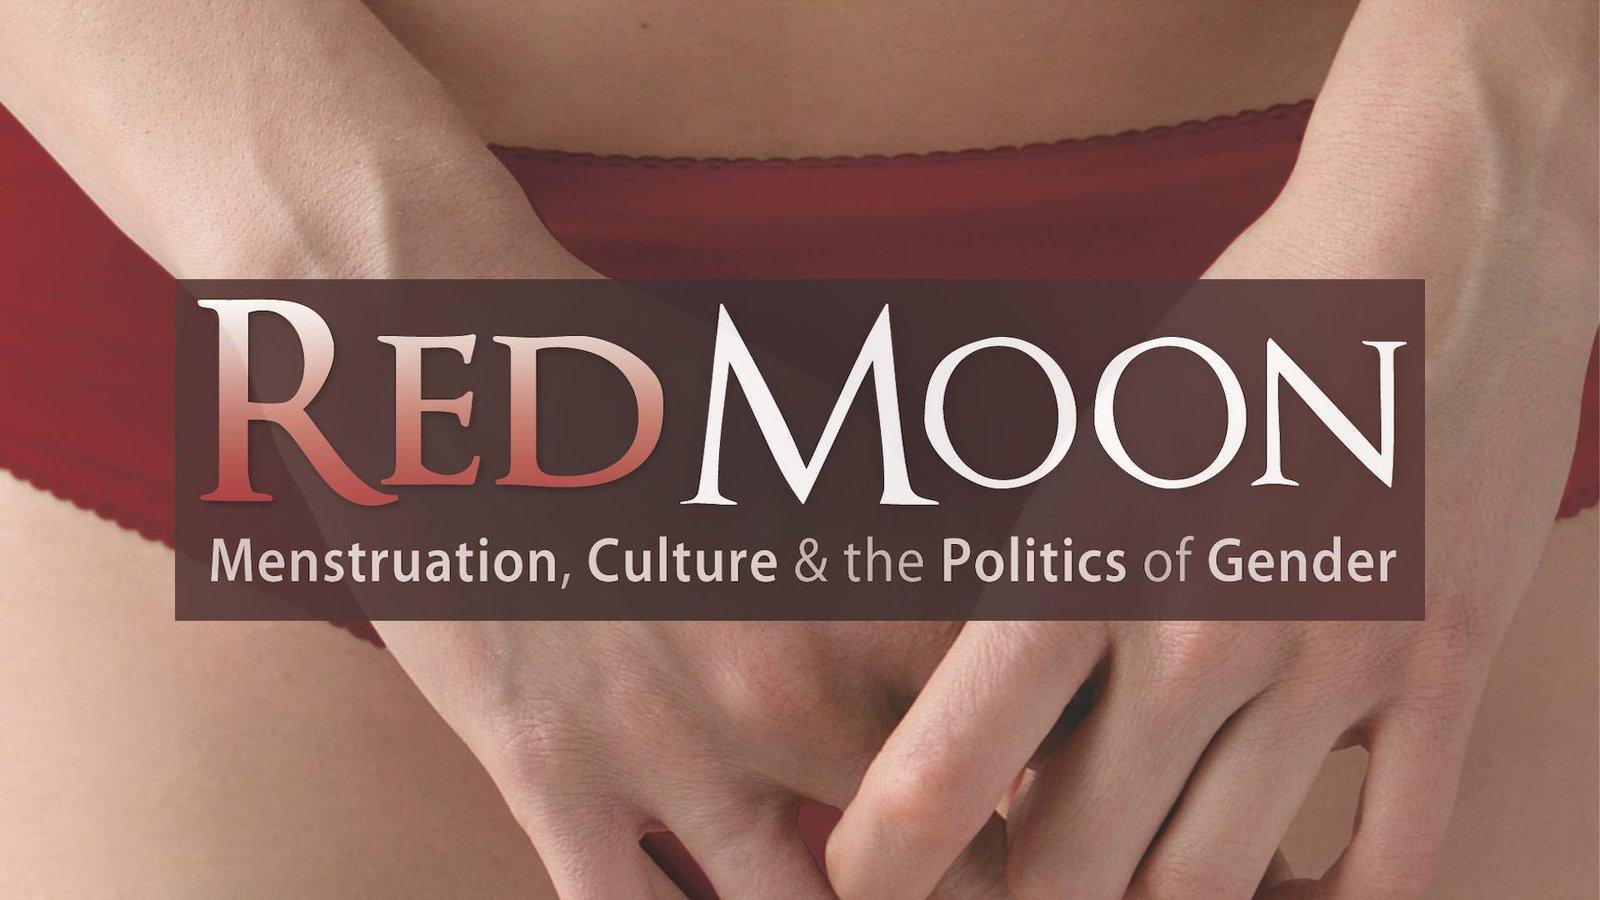 Red Moon - Menstruation, Culture & the Politics of Gender